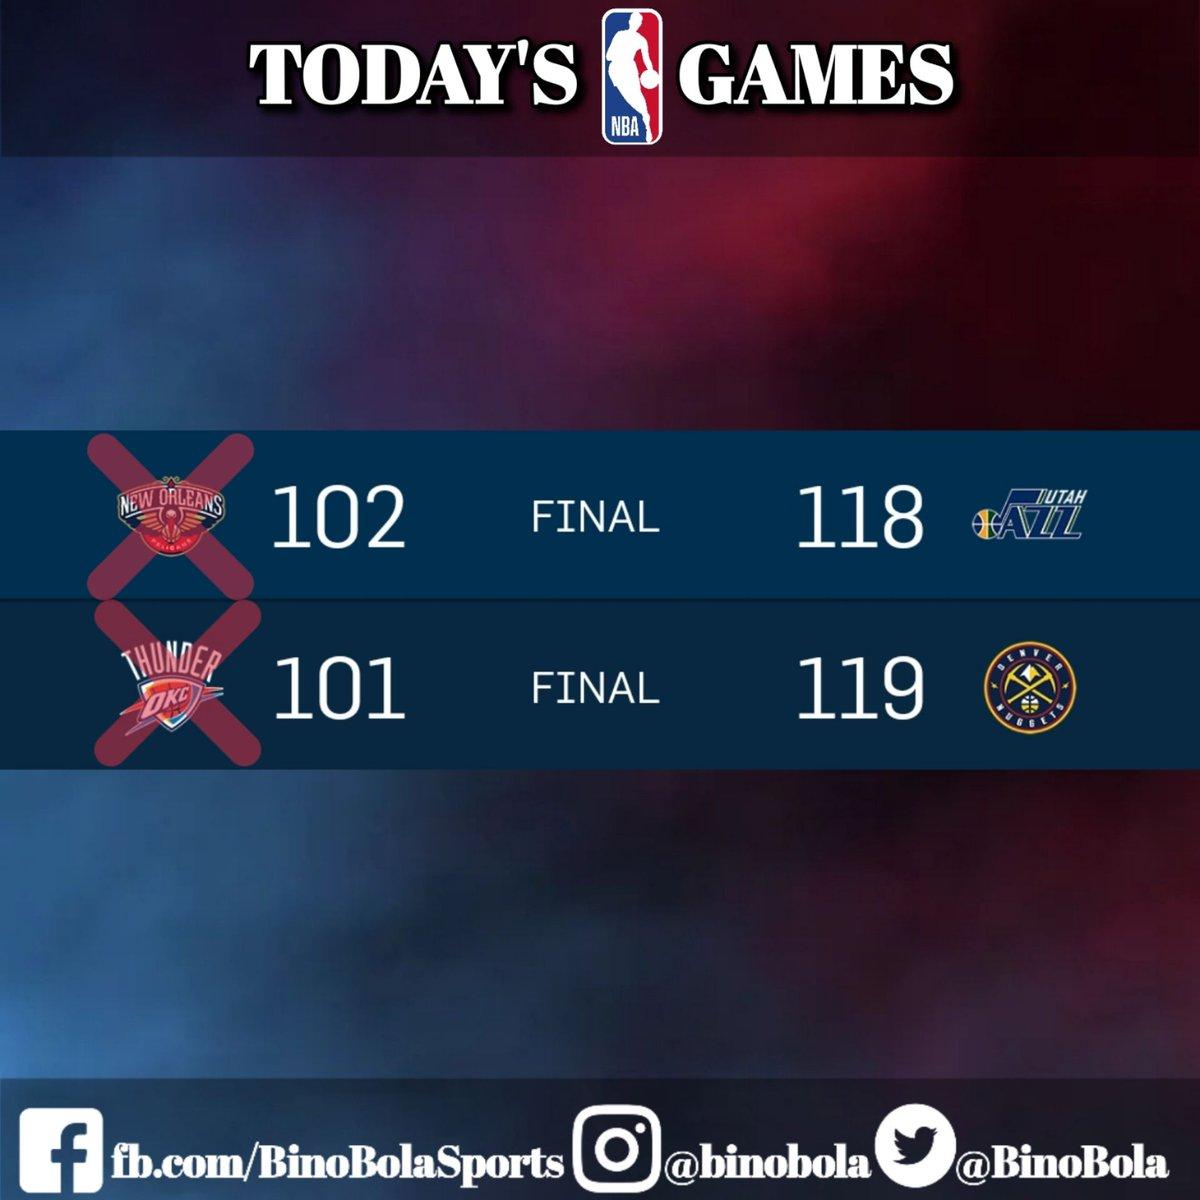 Take a look at the NBA games today!   #RegularSeason #Day28 #BinoBolaSports #Scores